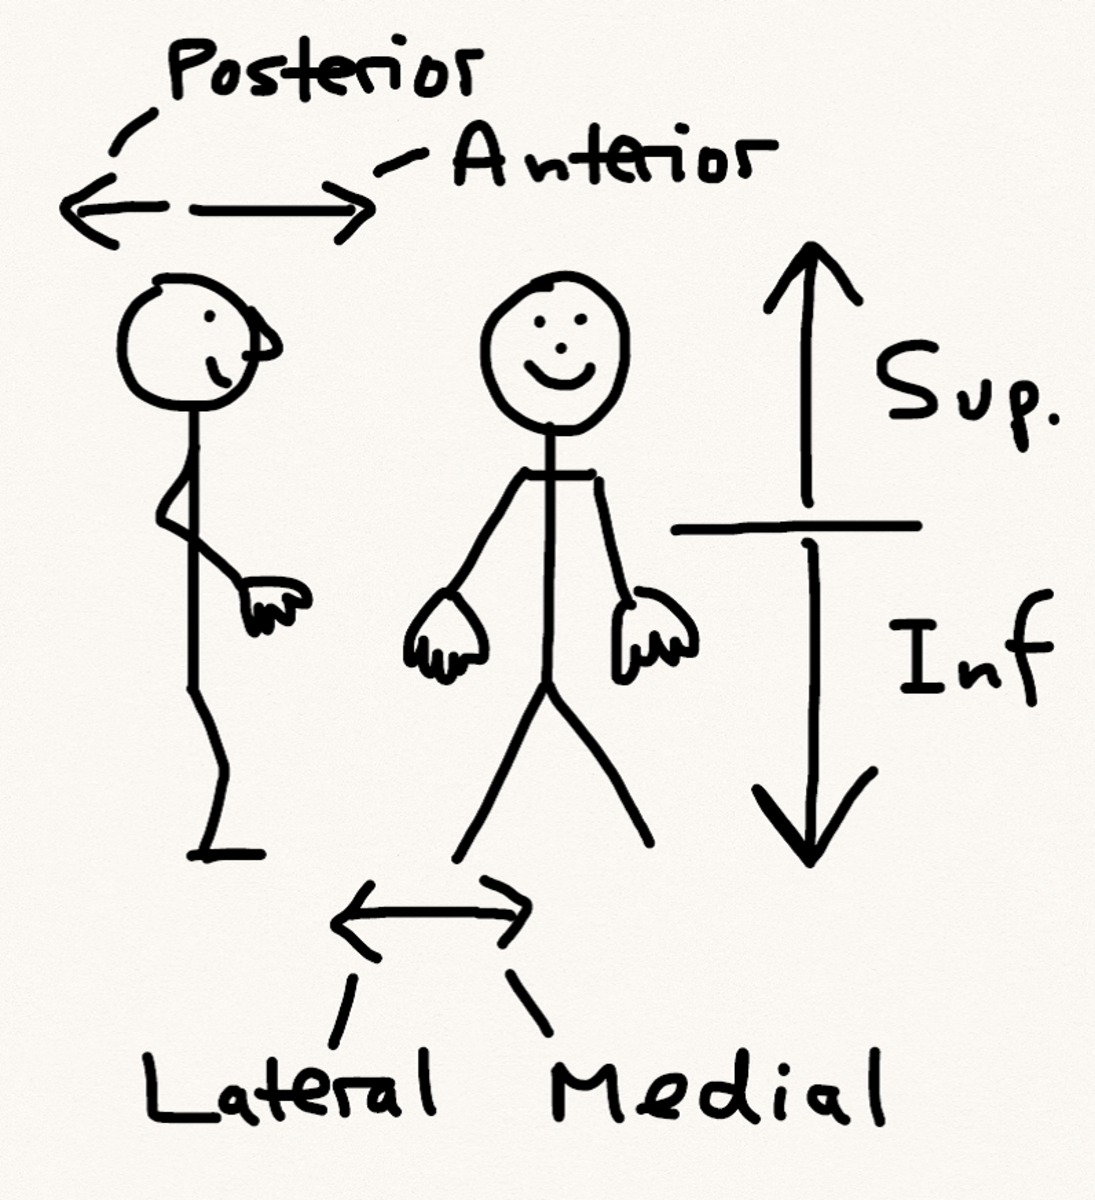 Anatomical terminology schematic